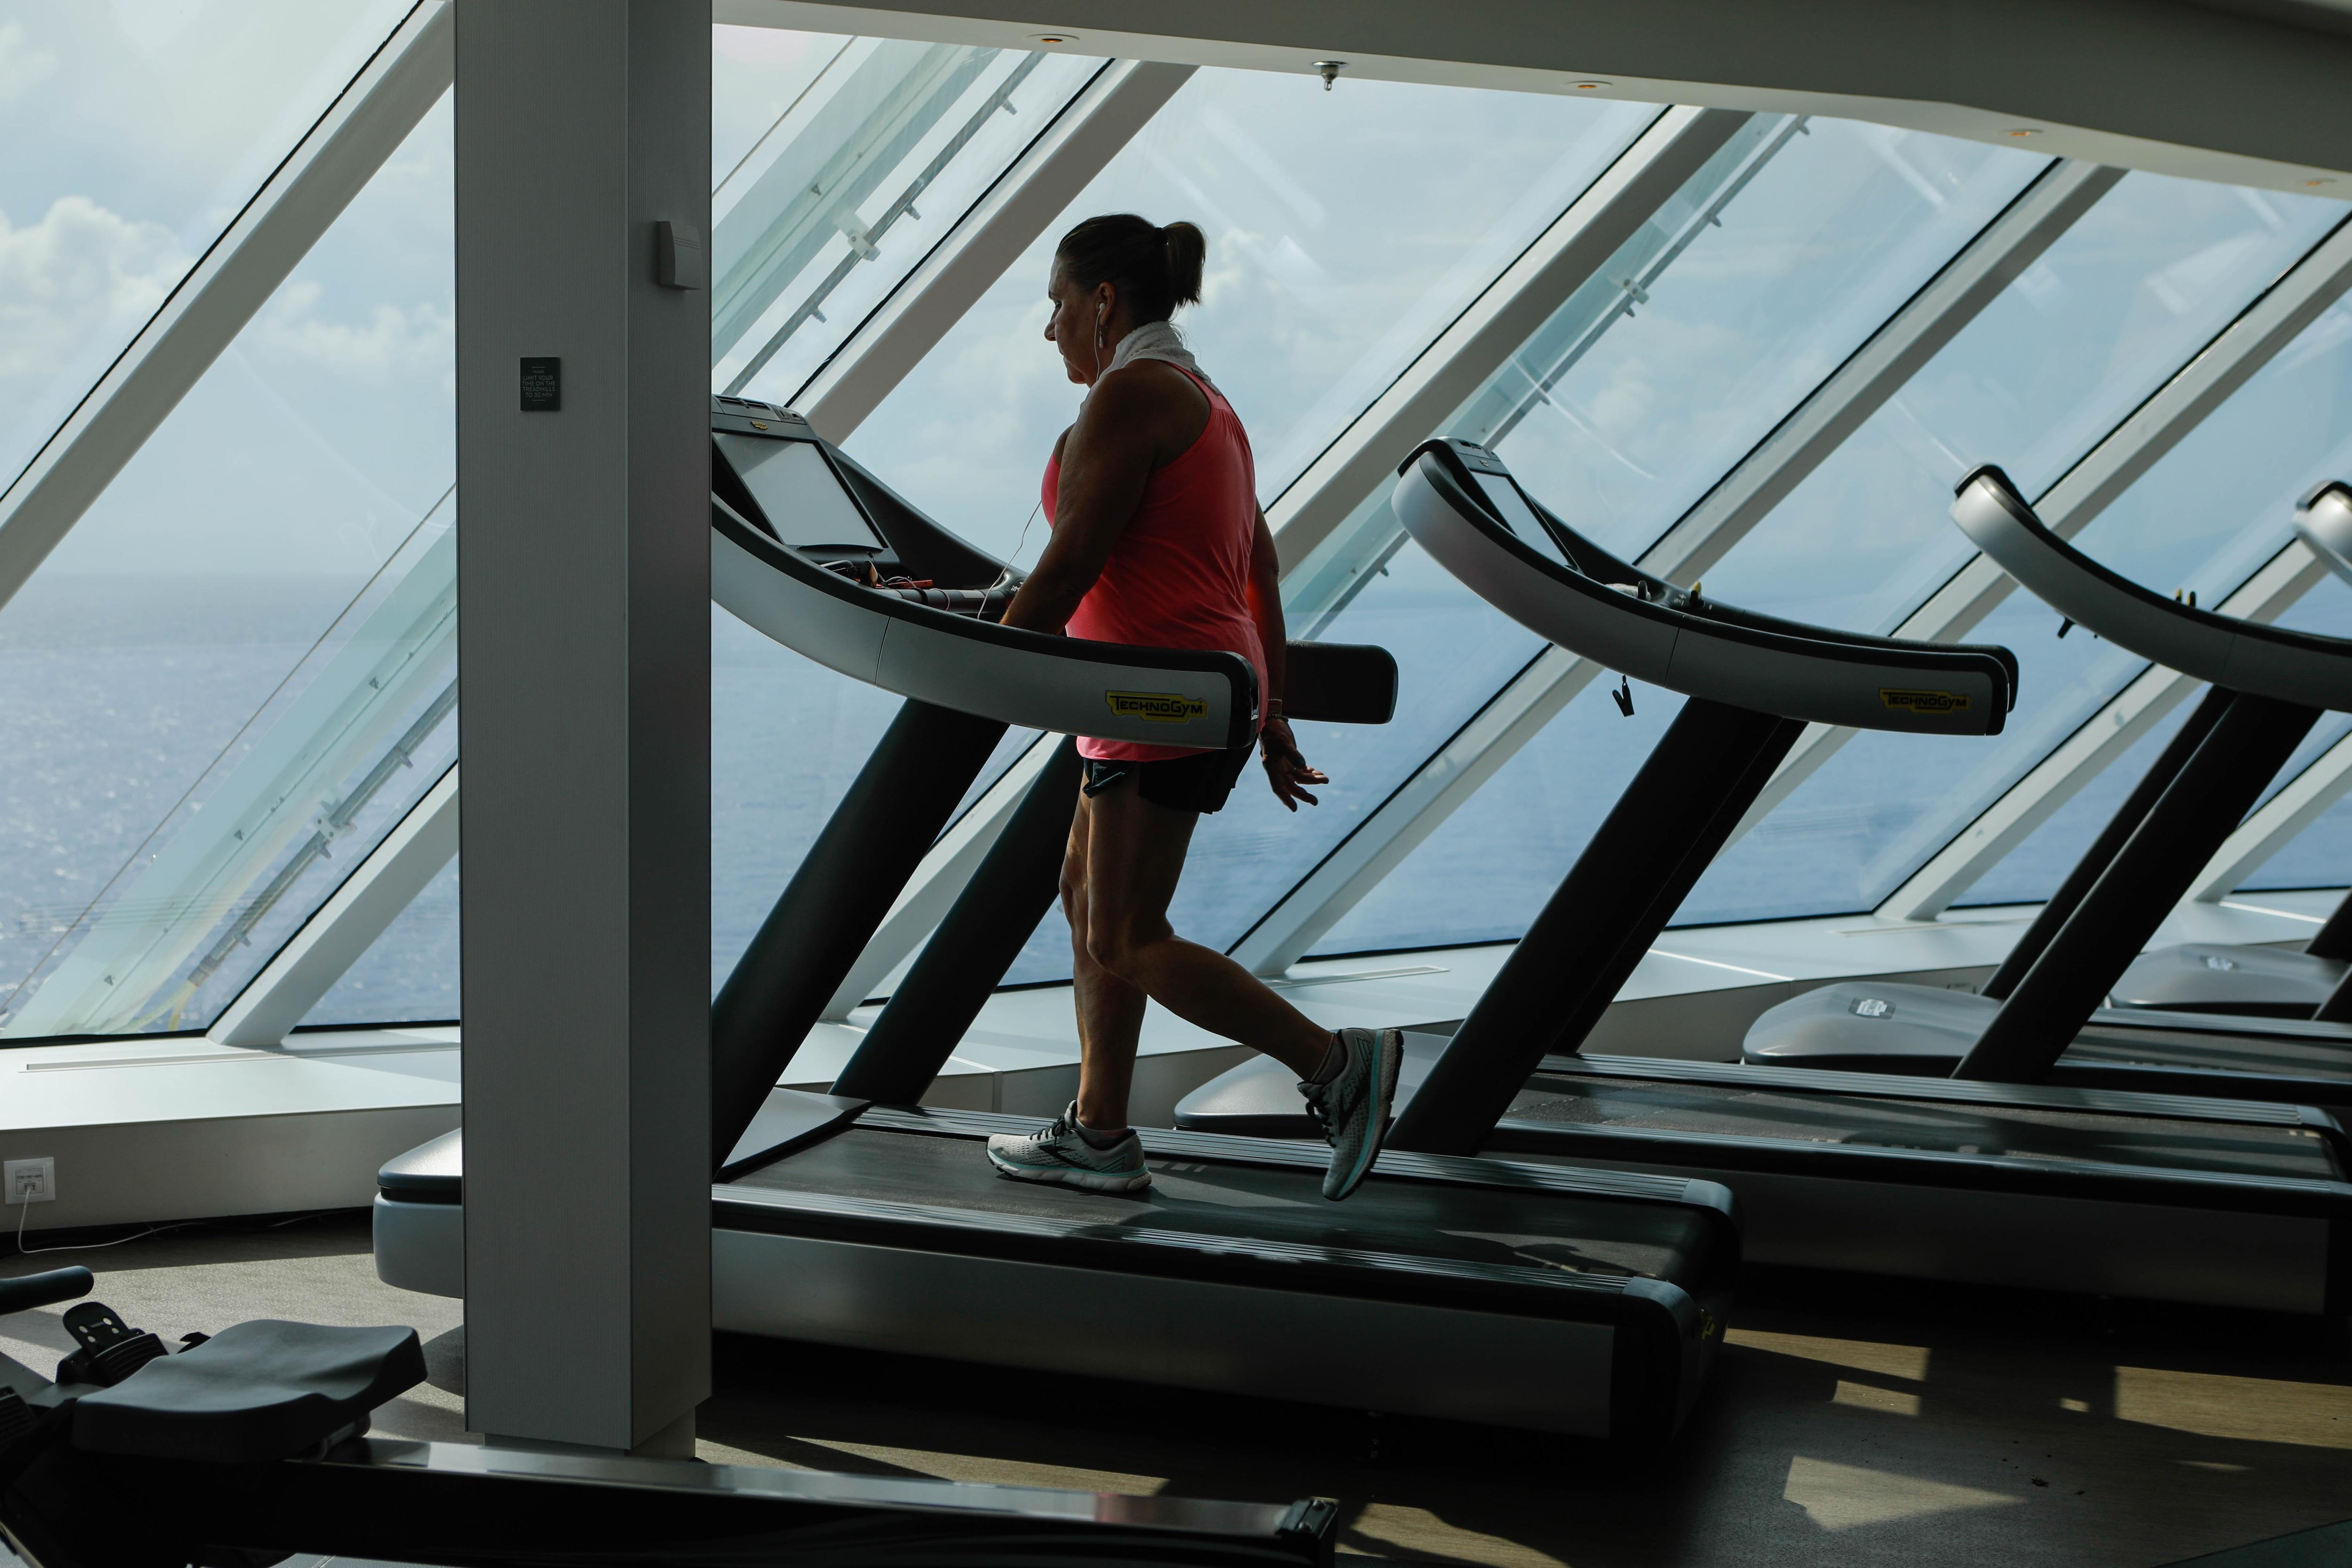 Inwell Fitness : এটি ফিটনেস সংক্রান্ত অ্যাপ। যা তৈরি করেছে Reuben Germaine। (ছবিটি প্রতীকী, সৌজন্য ব্লুমবার্গ)